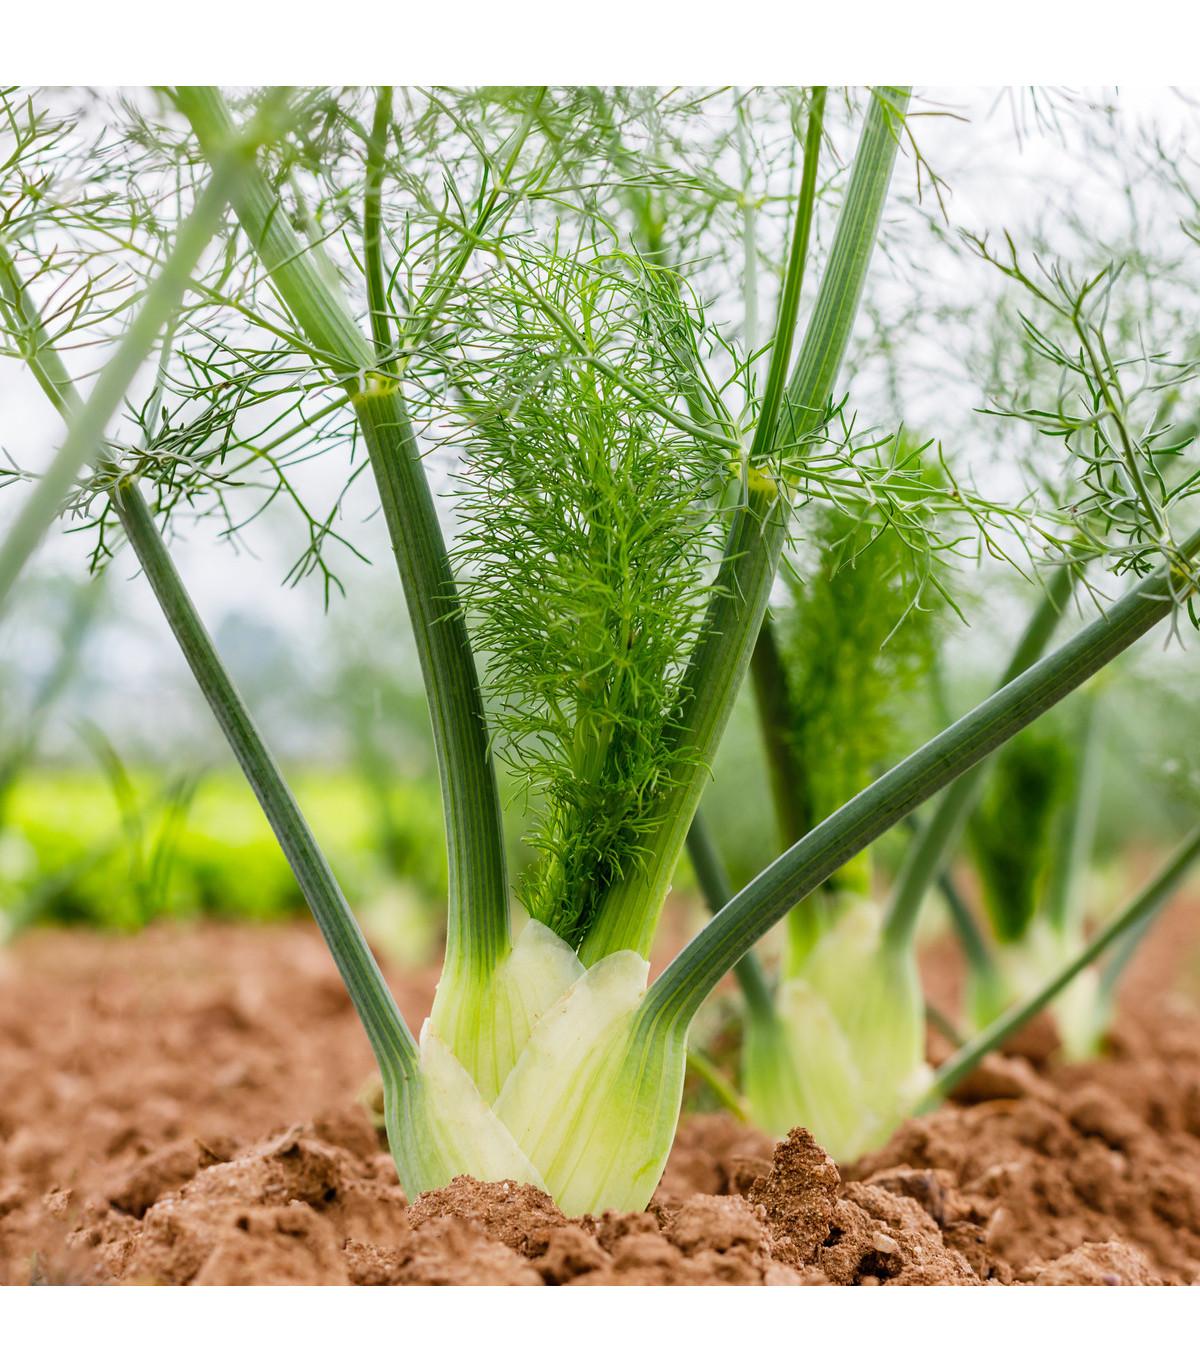 BIO fenikel buľvový Fino - Foeniculum vulgare - bio semená fenikla - 50 ks